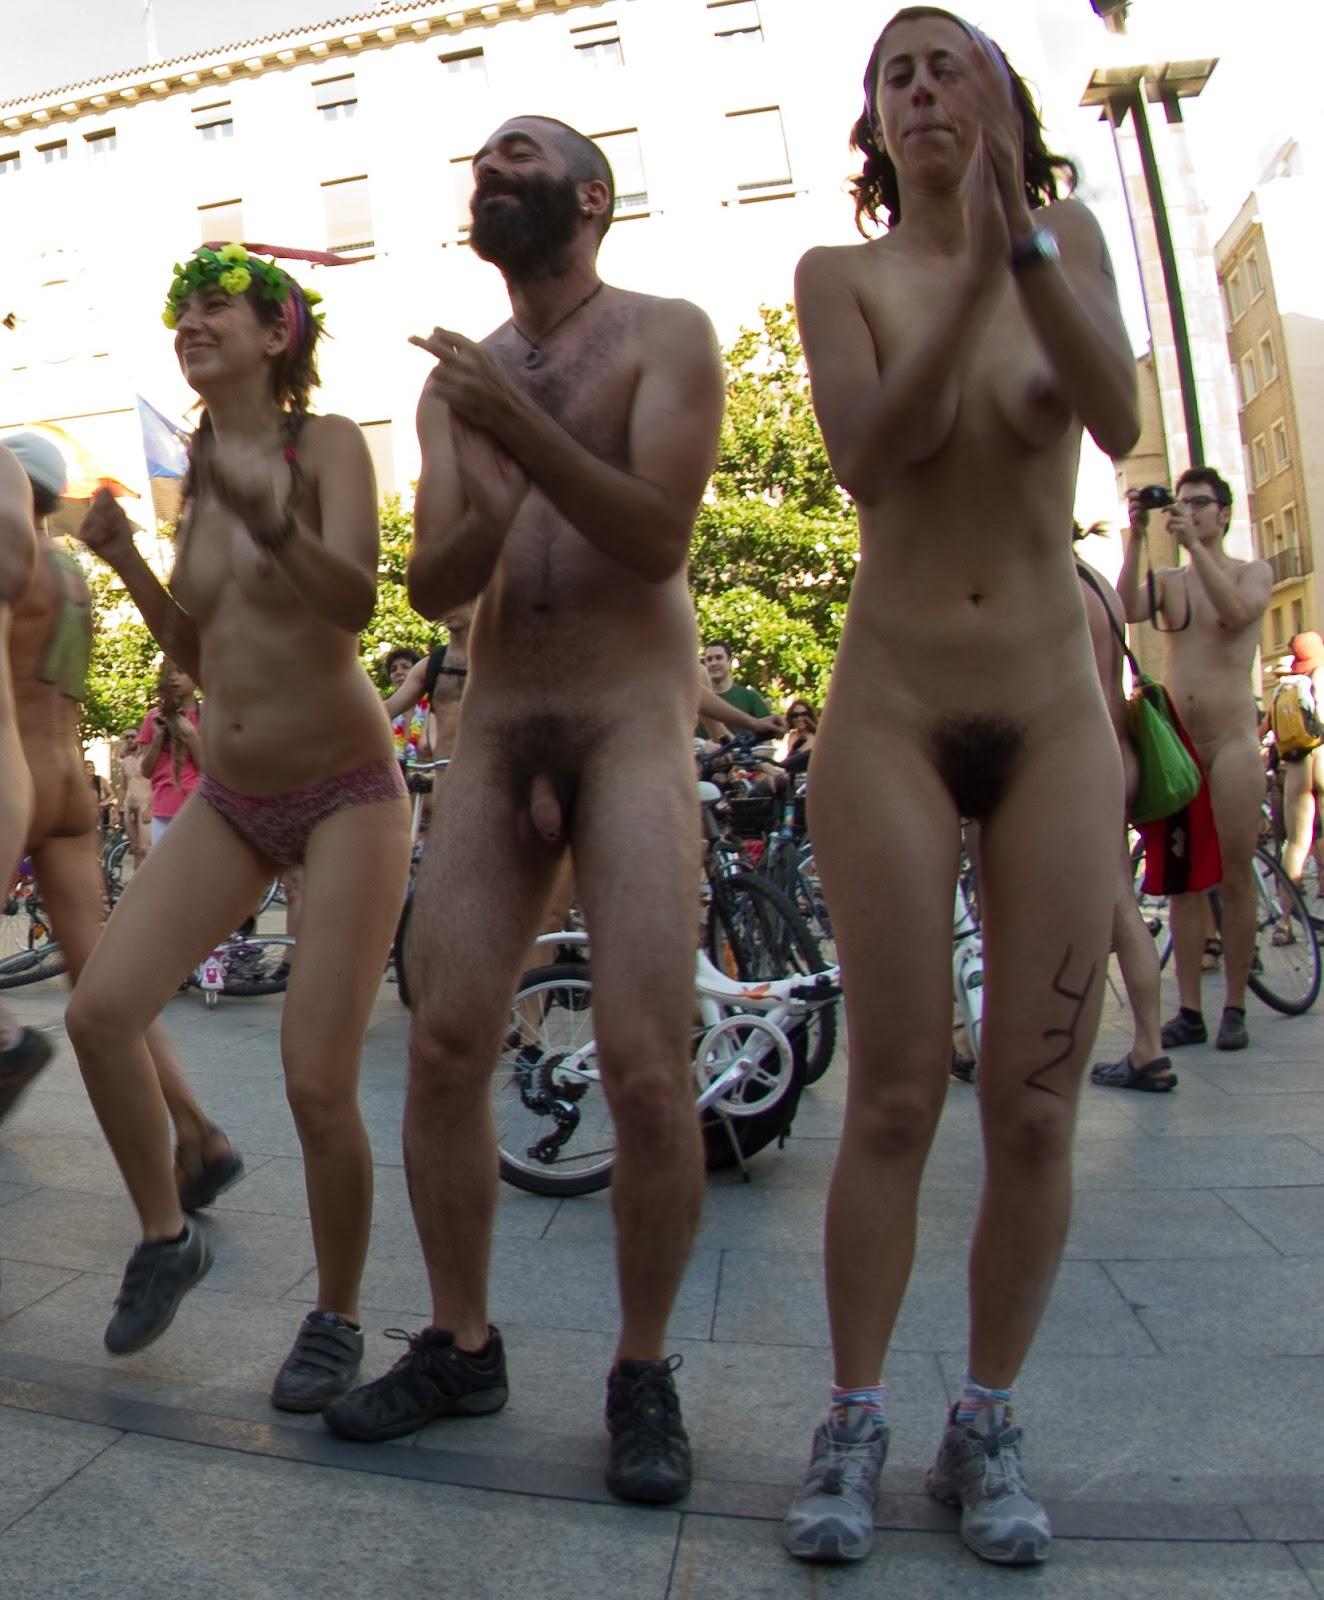 world naked bike ride 2011 zaragoza spain 2011